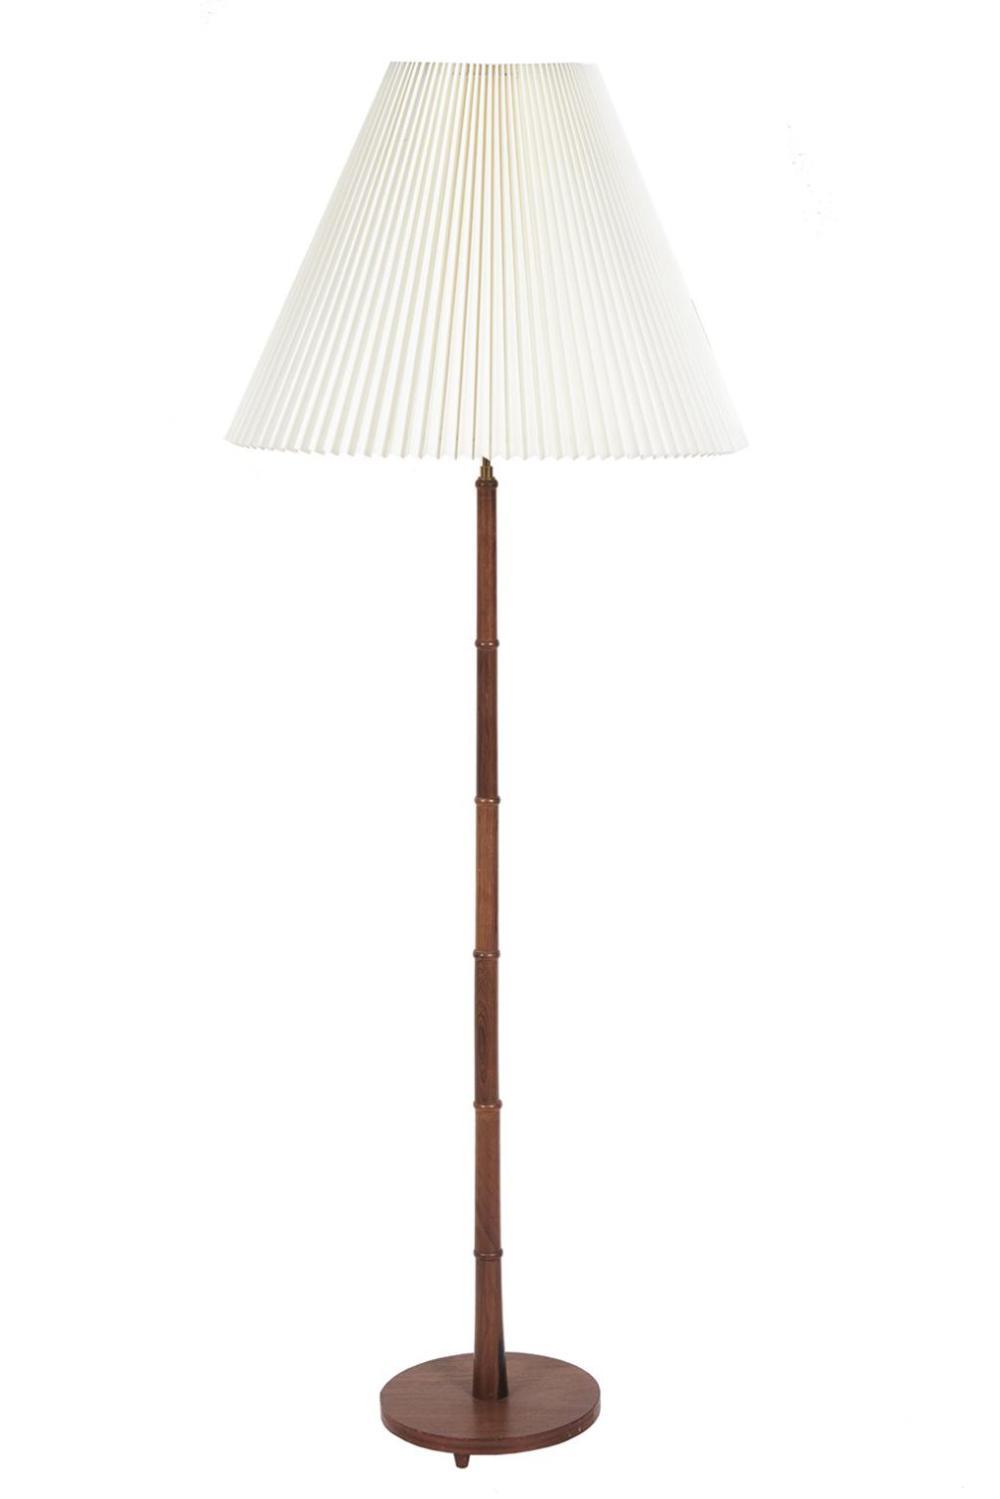 Danish Faux Bamboo Floor Lamp c. 1960